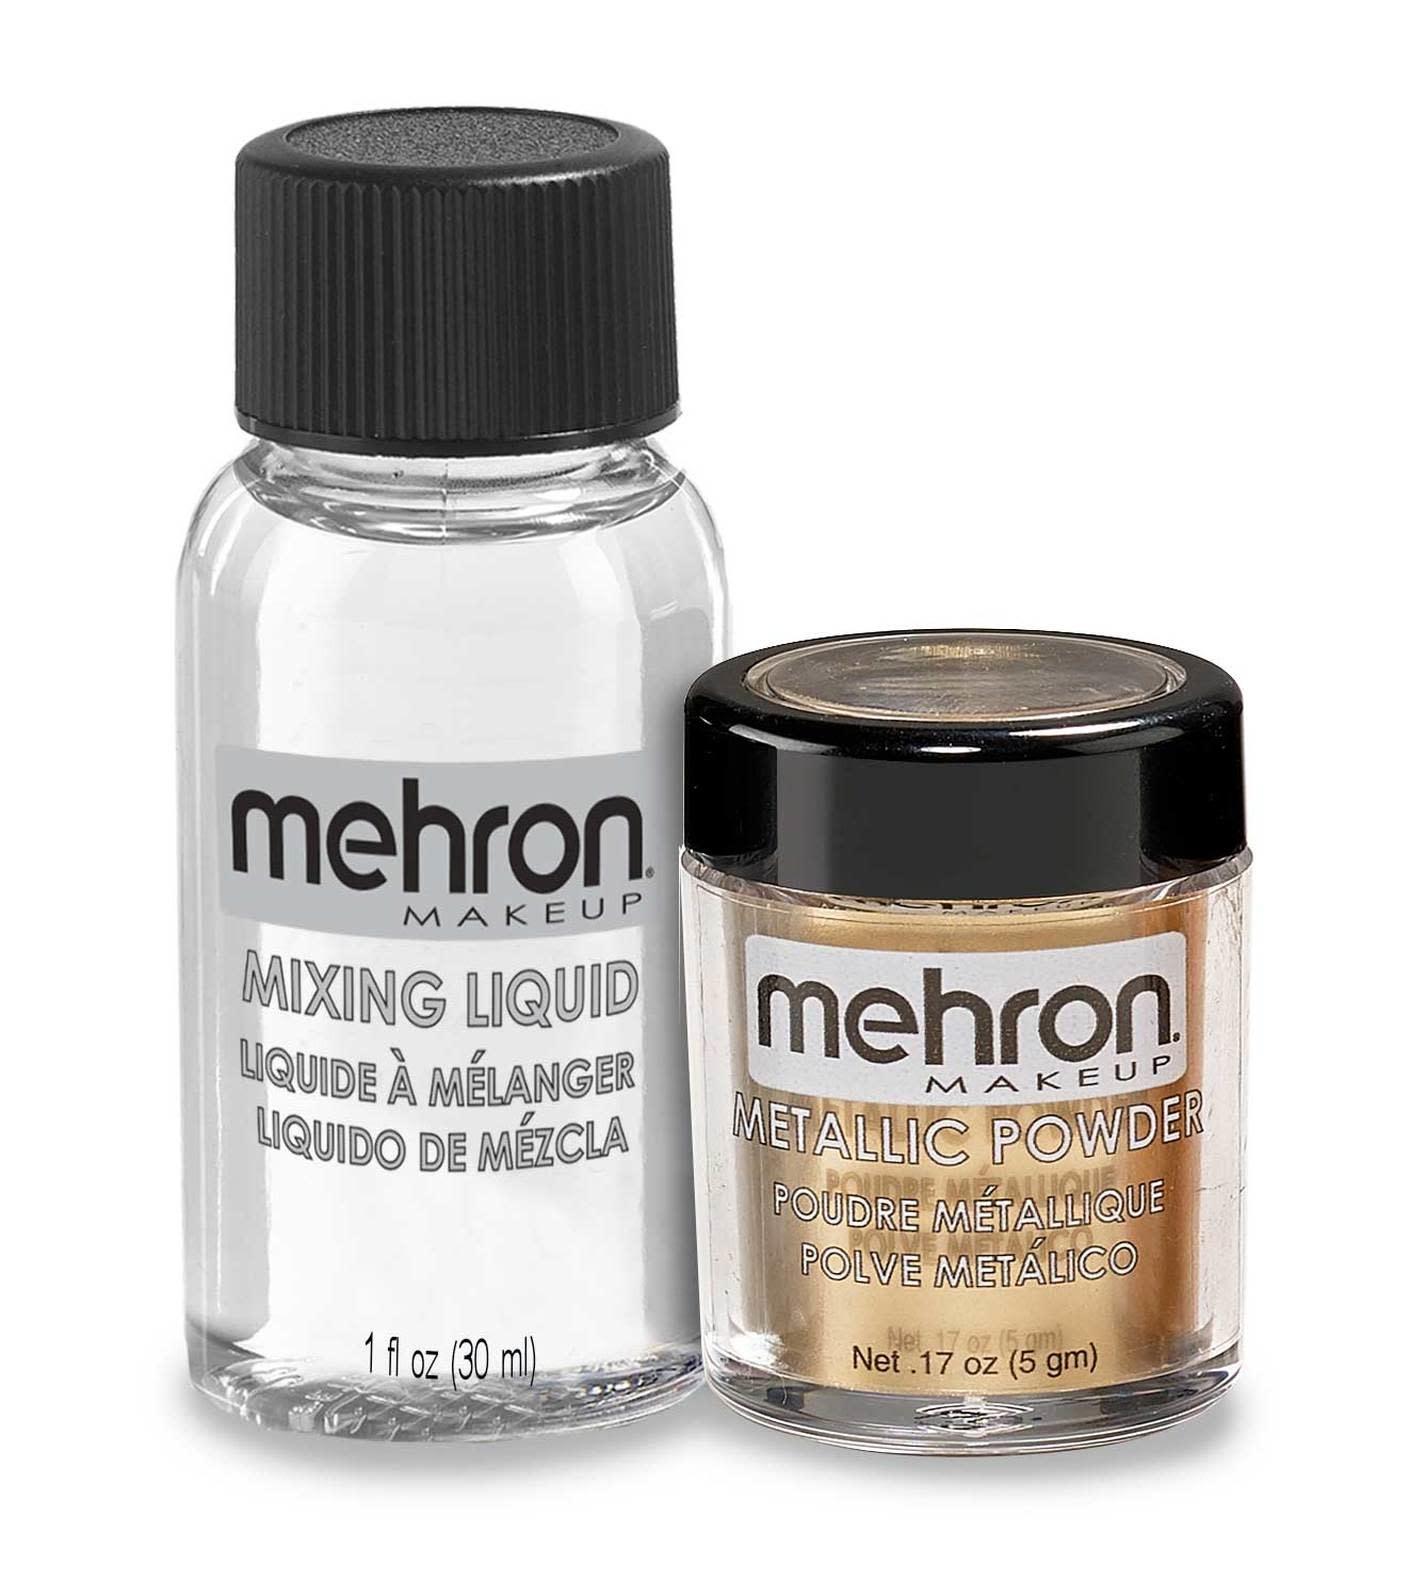 Mehron Metallic Powder with Mixing Liquid Gold